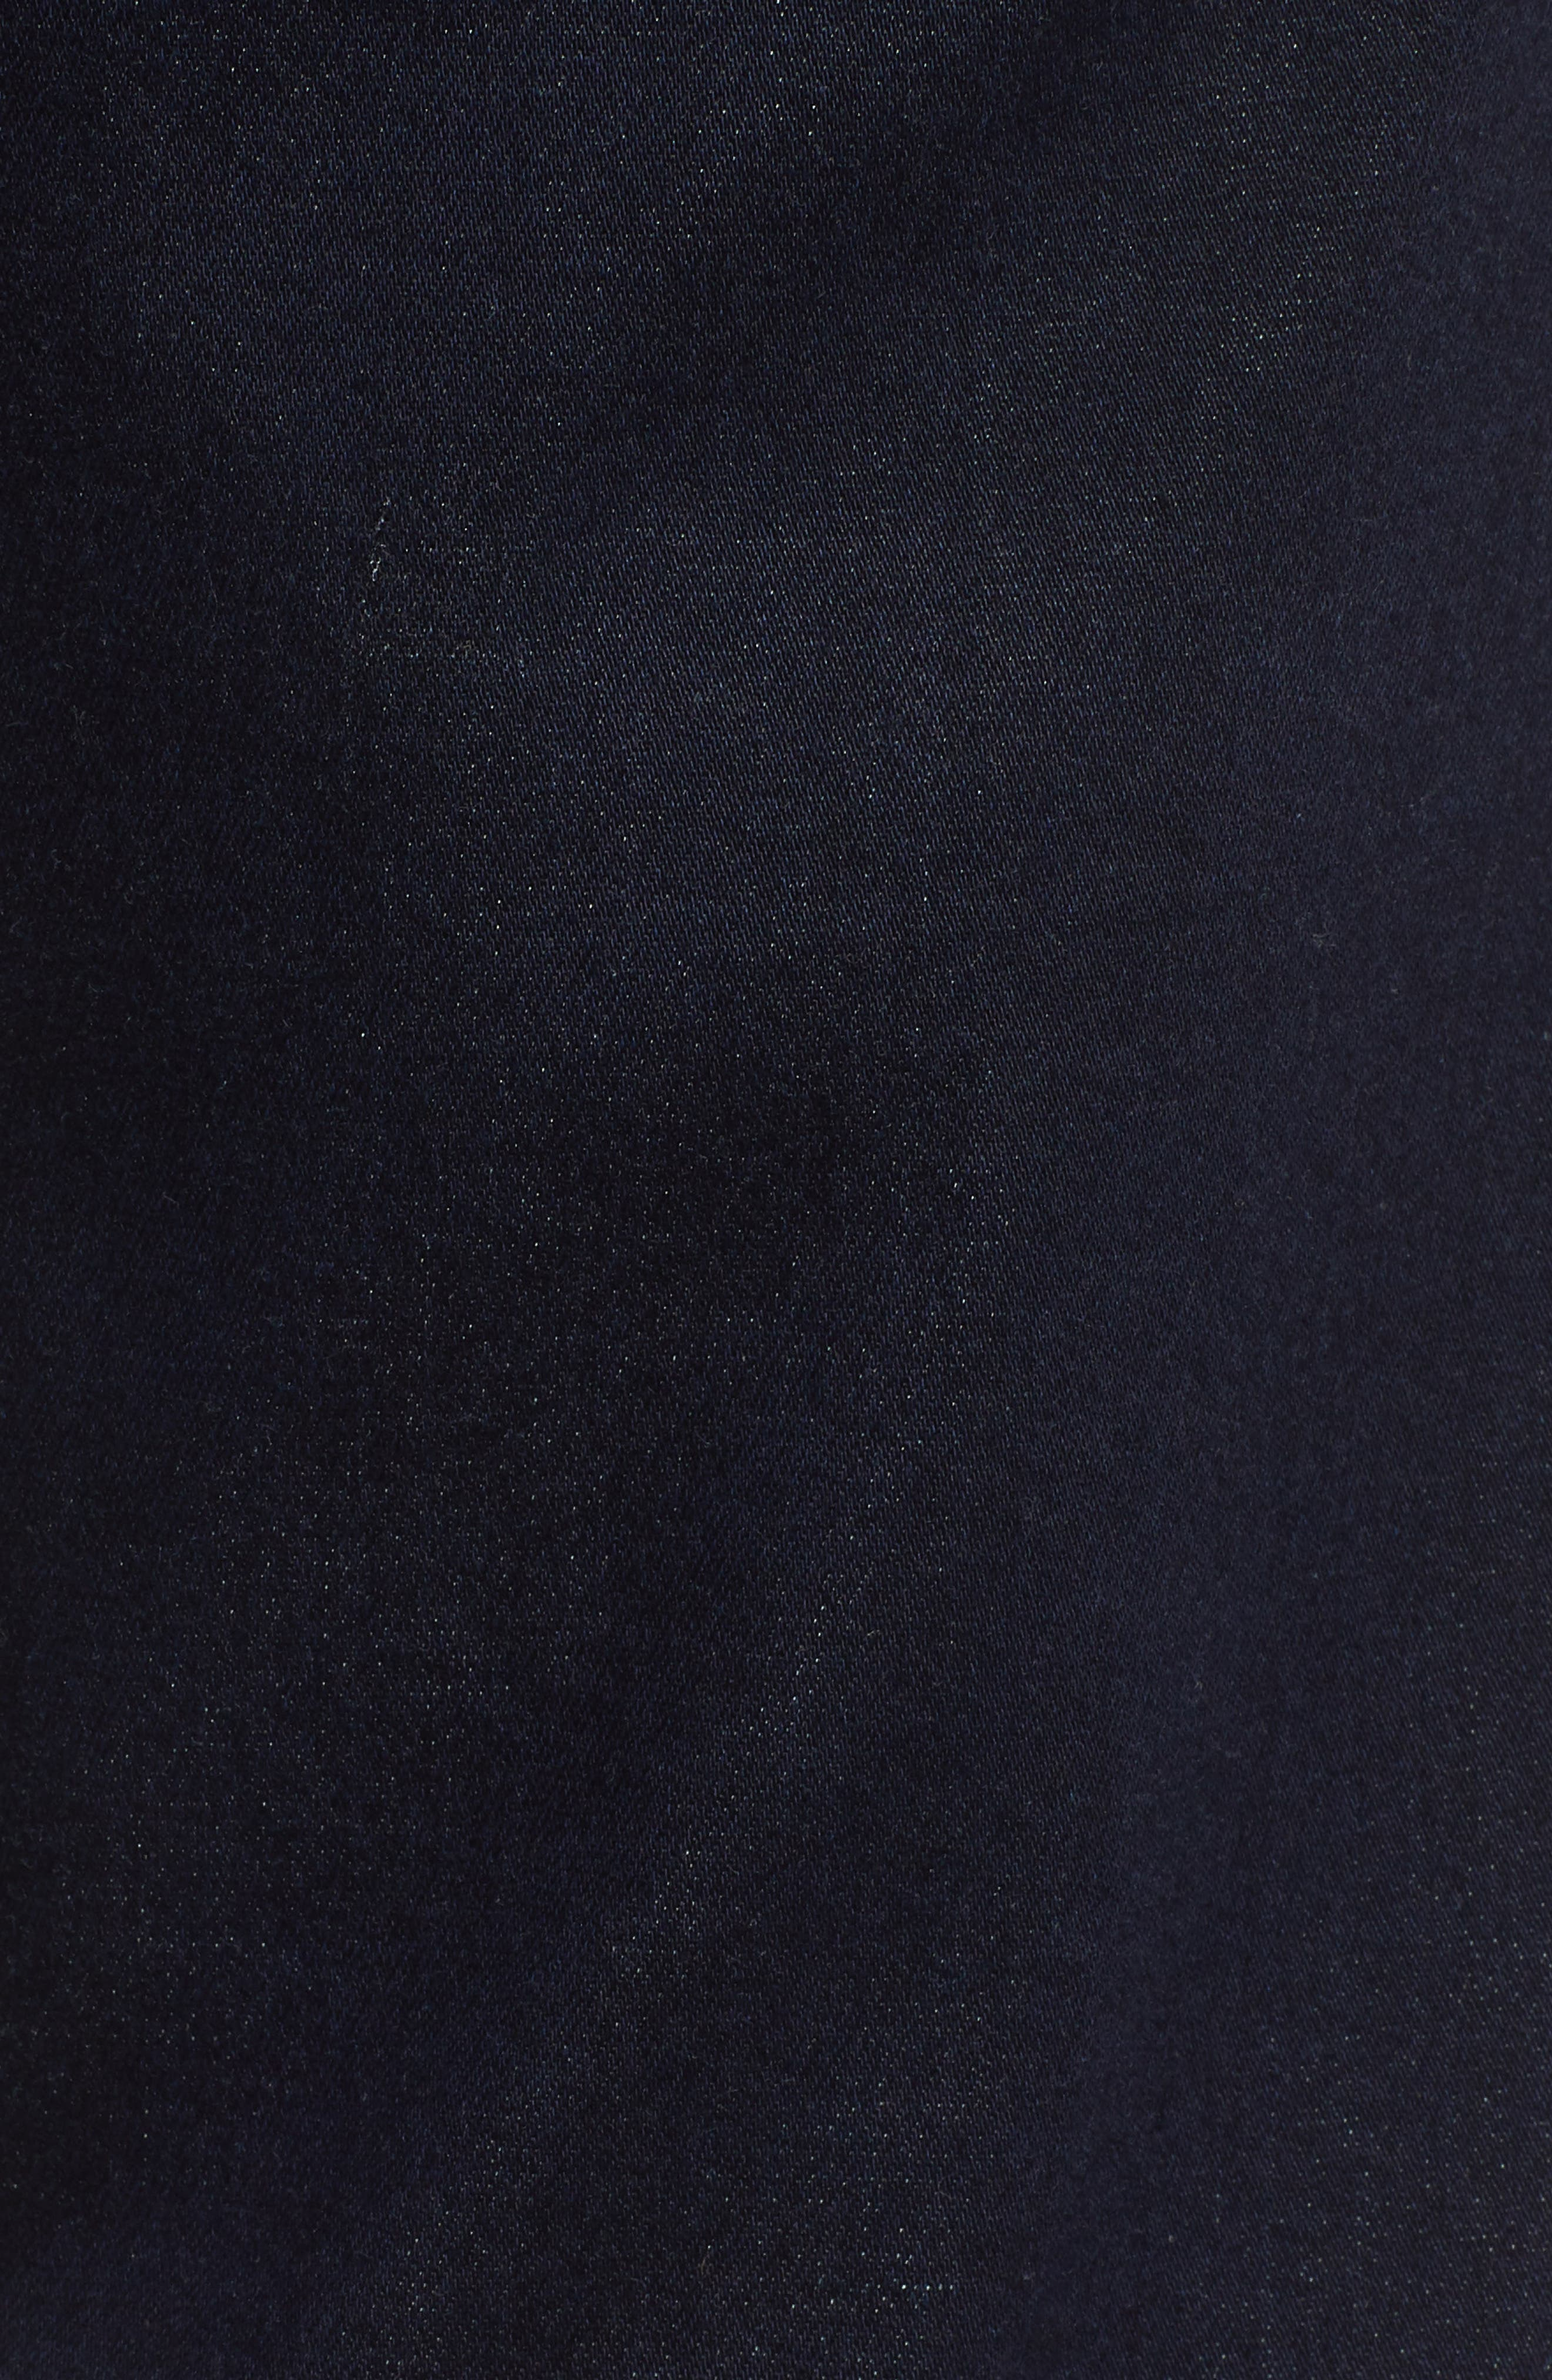 Matt Relaxed Fit Straight Leg Jeans,                             Alternate thumbnail 5, color,                             DEEP RINSE SOFT MOVE